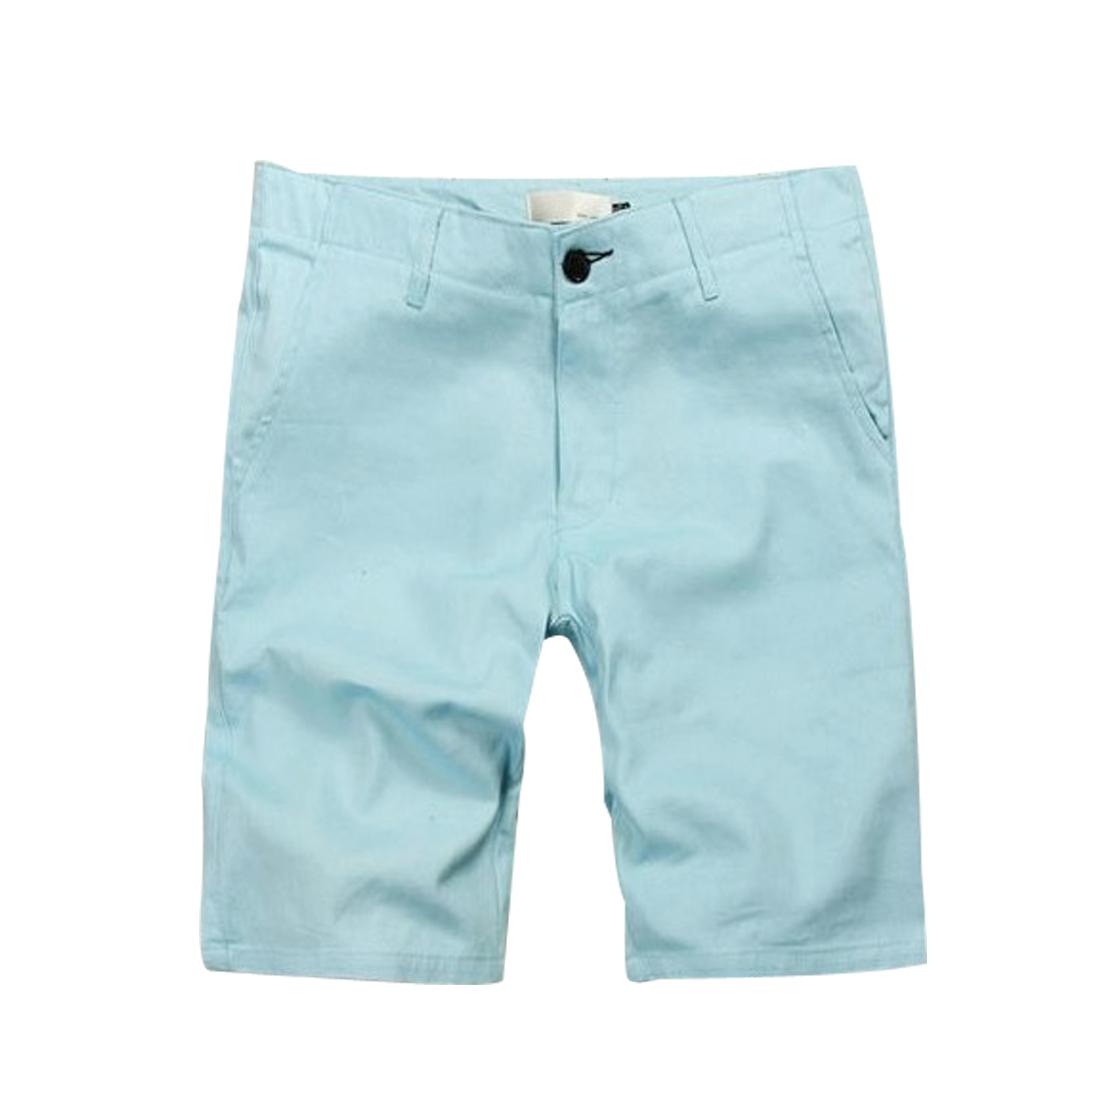 Man Candy Color Hip Patch Pockets Button Closure Knee Length Pants Sky Blue W34